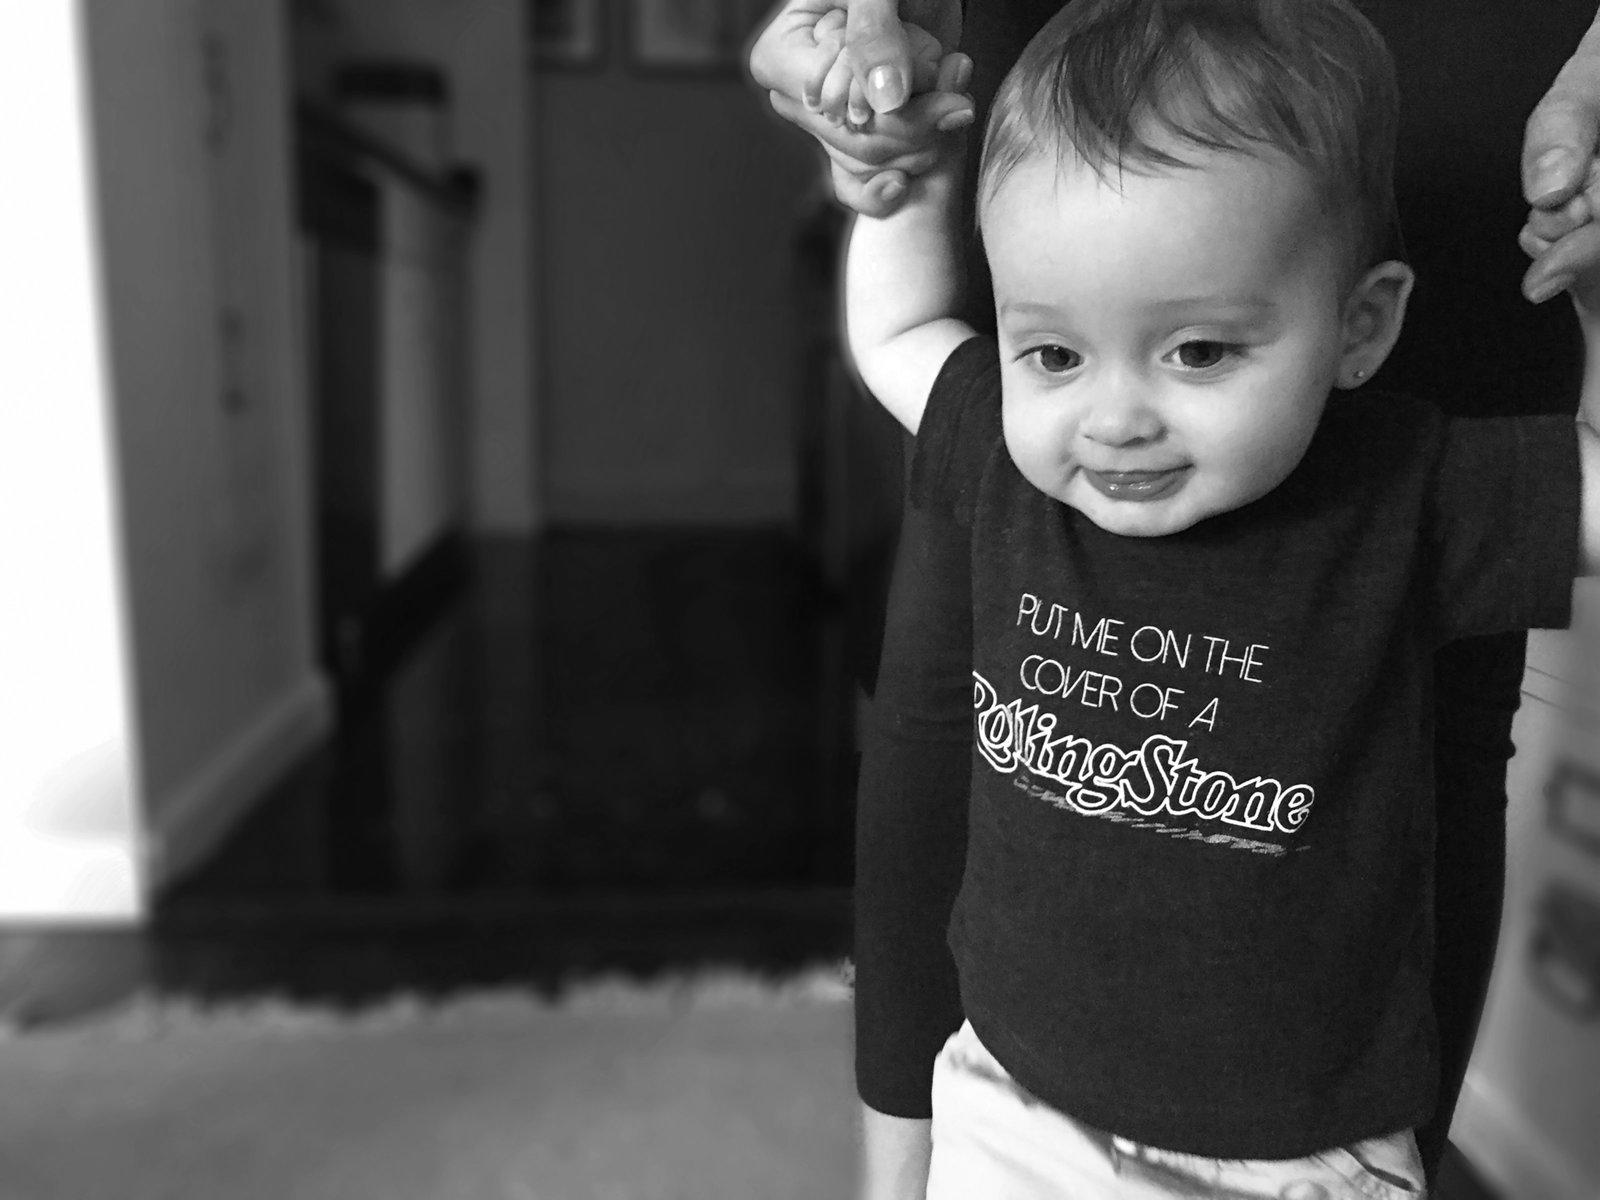 2015_08_06_Emilia_In_Rolling_Stones_Tshirt